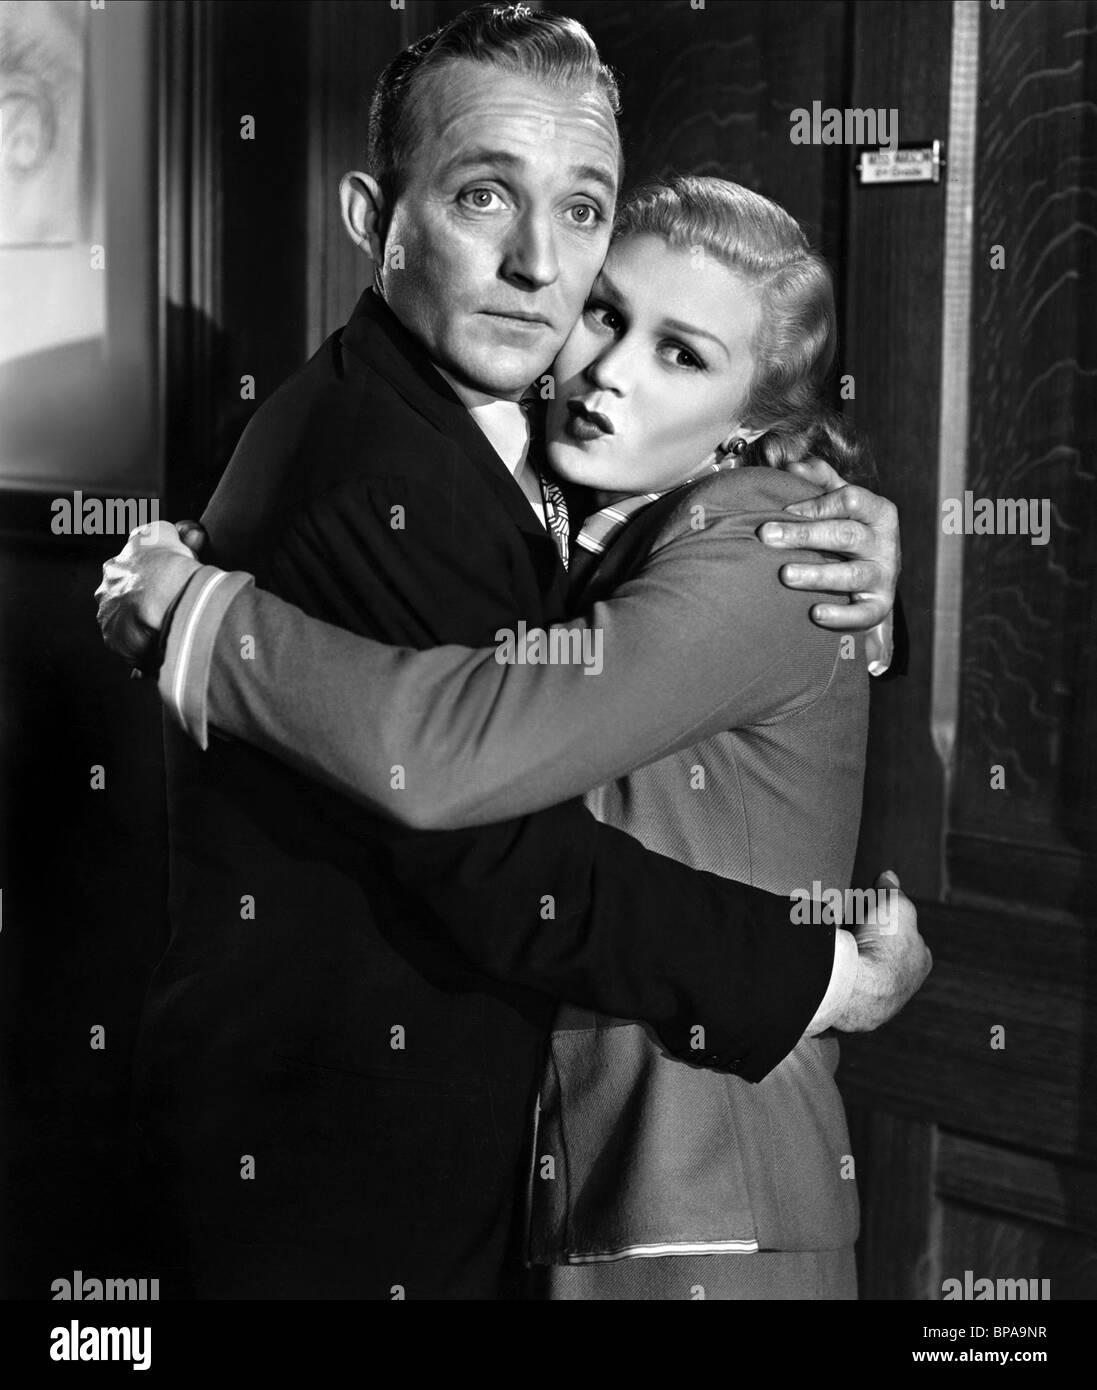 Bing crosby joan caulfield welcome stranger 1947 stock image